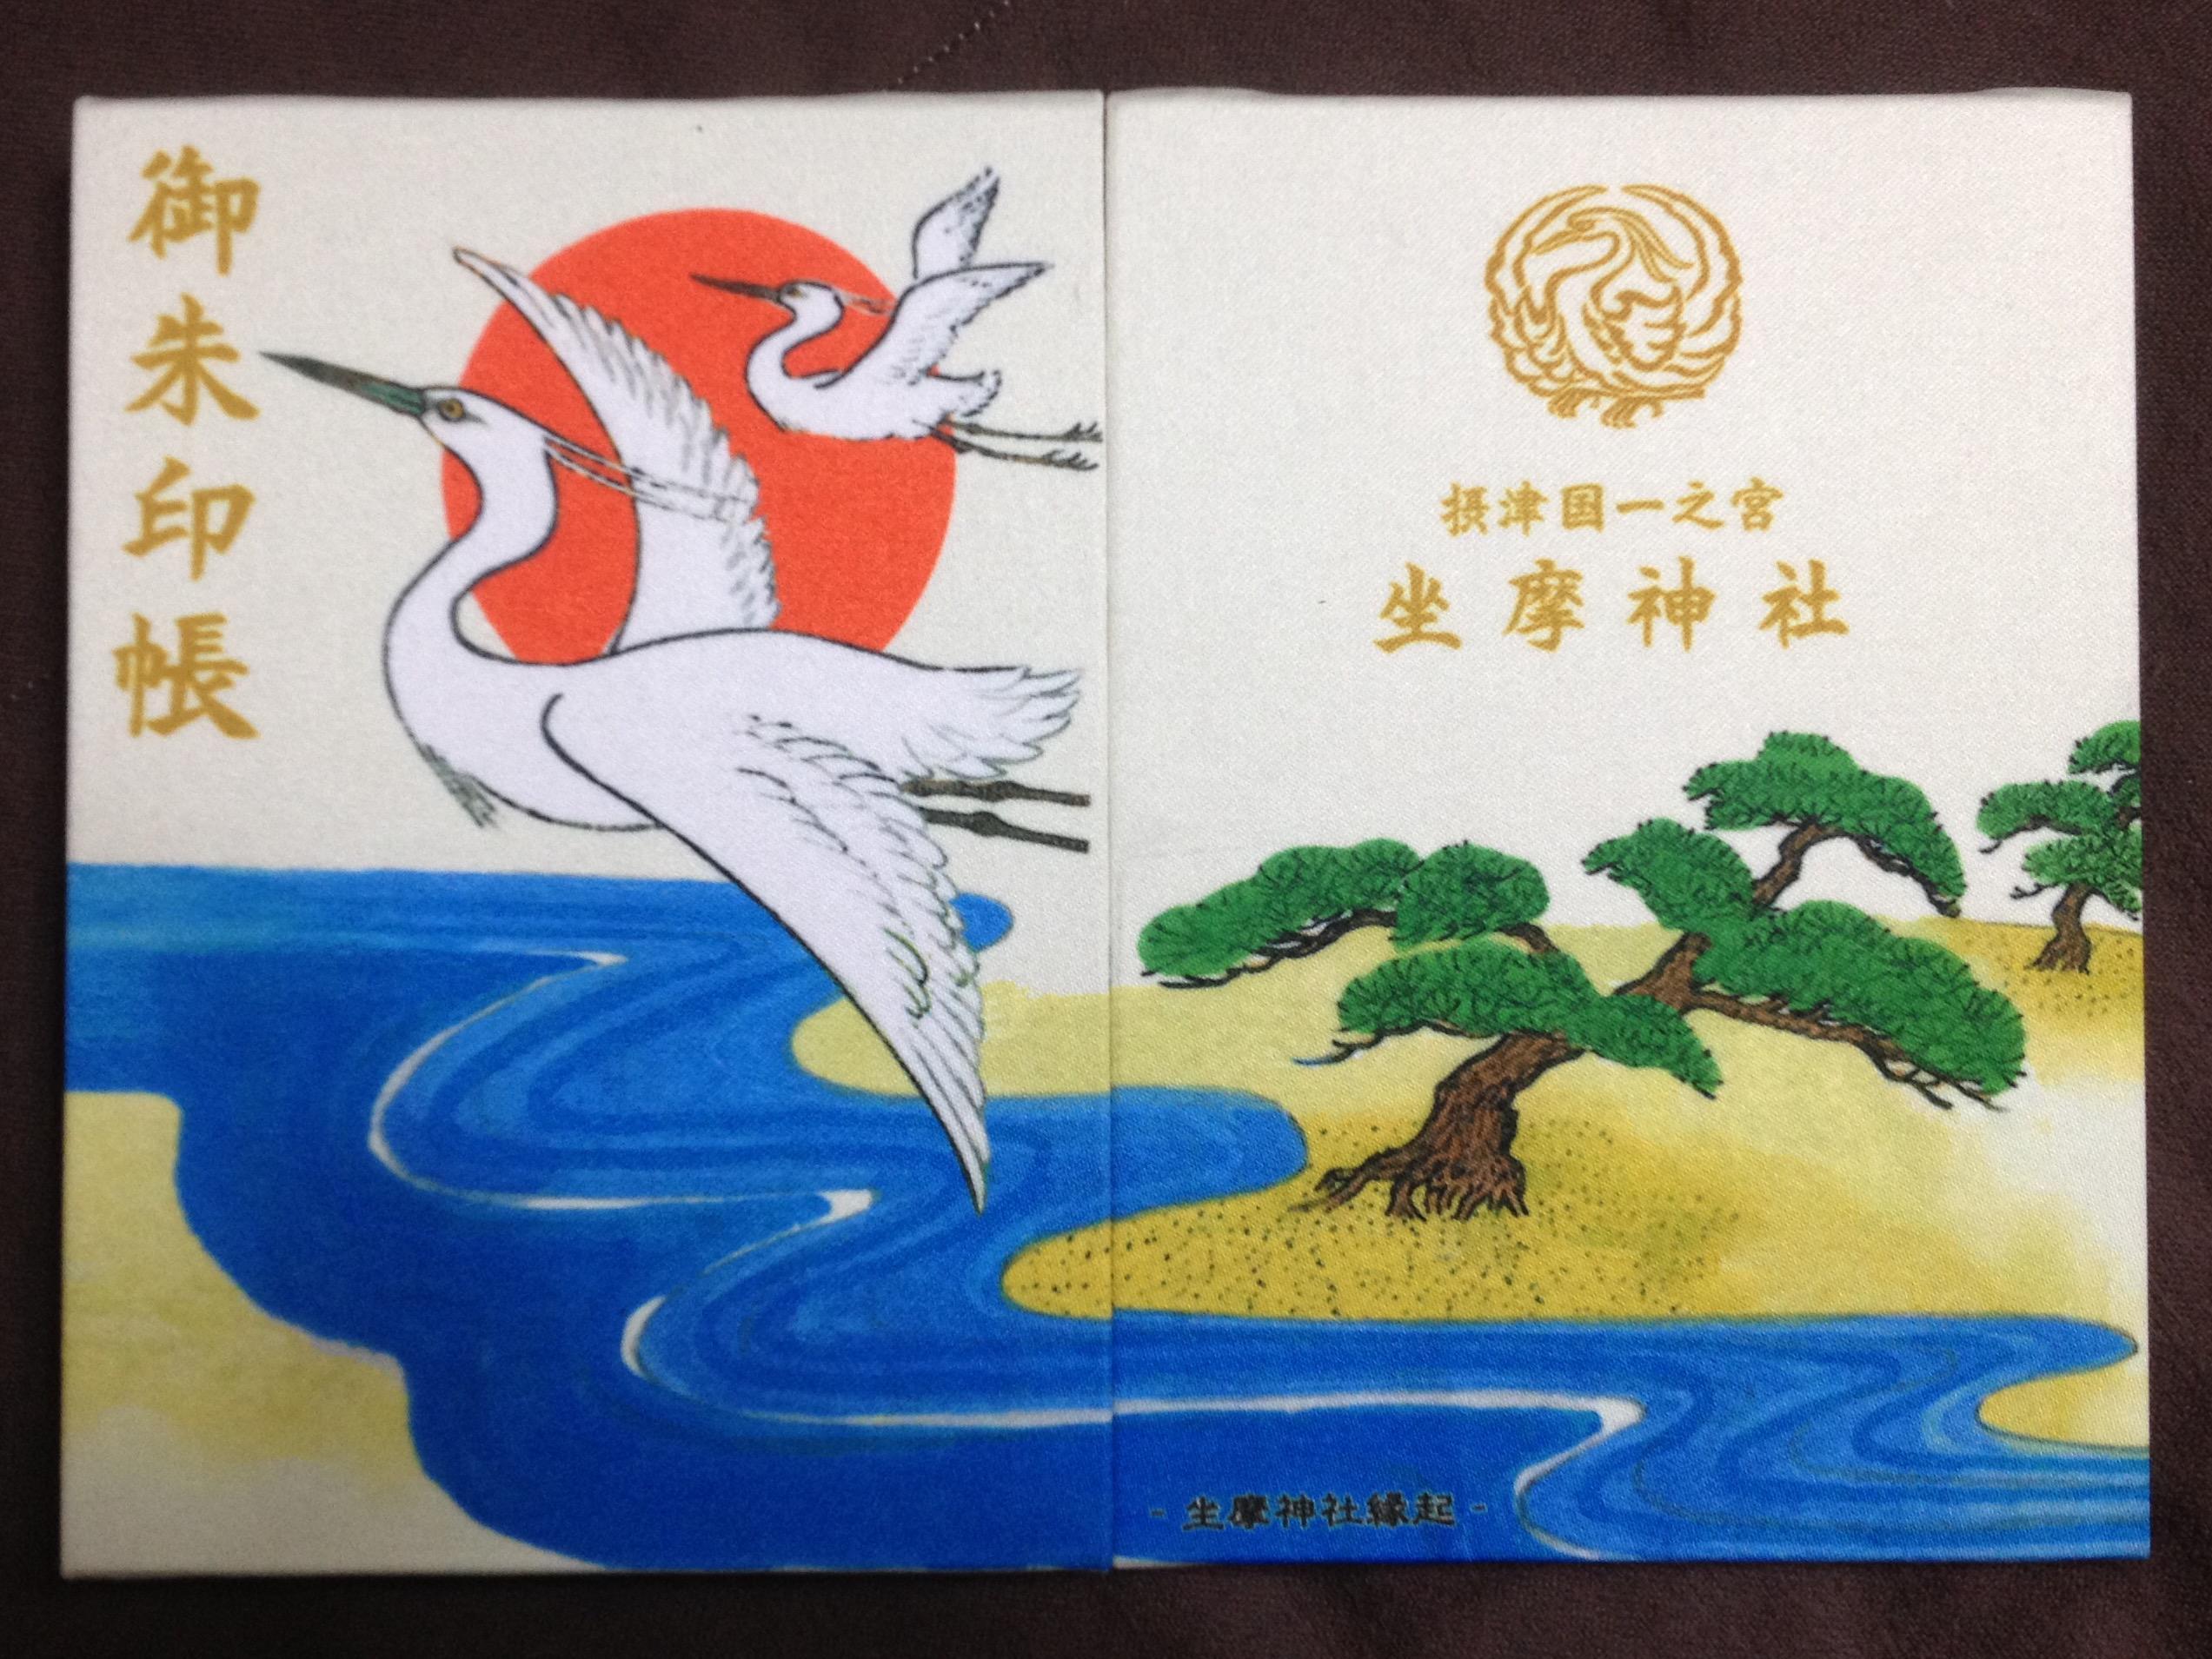 坐摩神社の御朱印帳